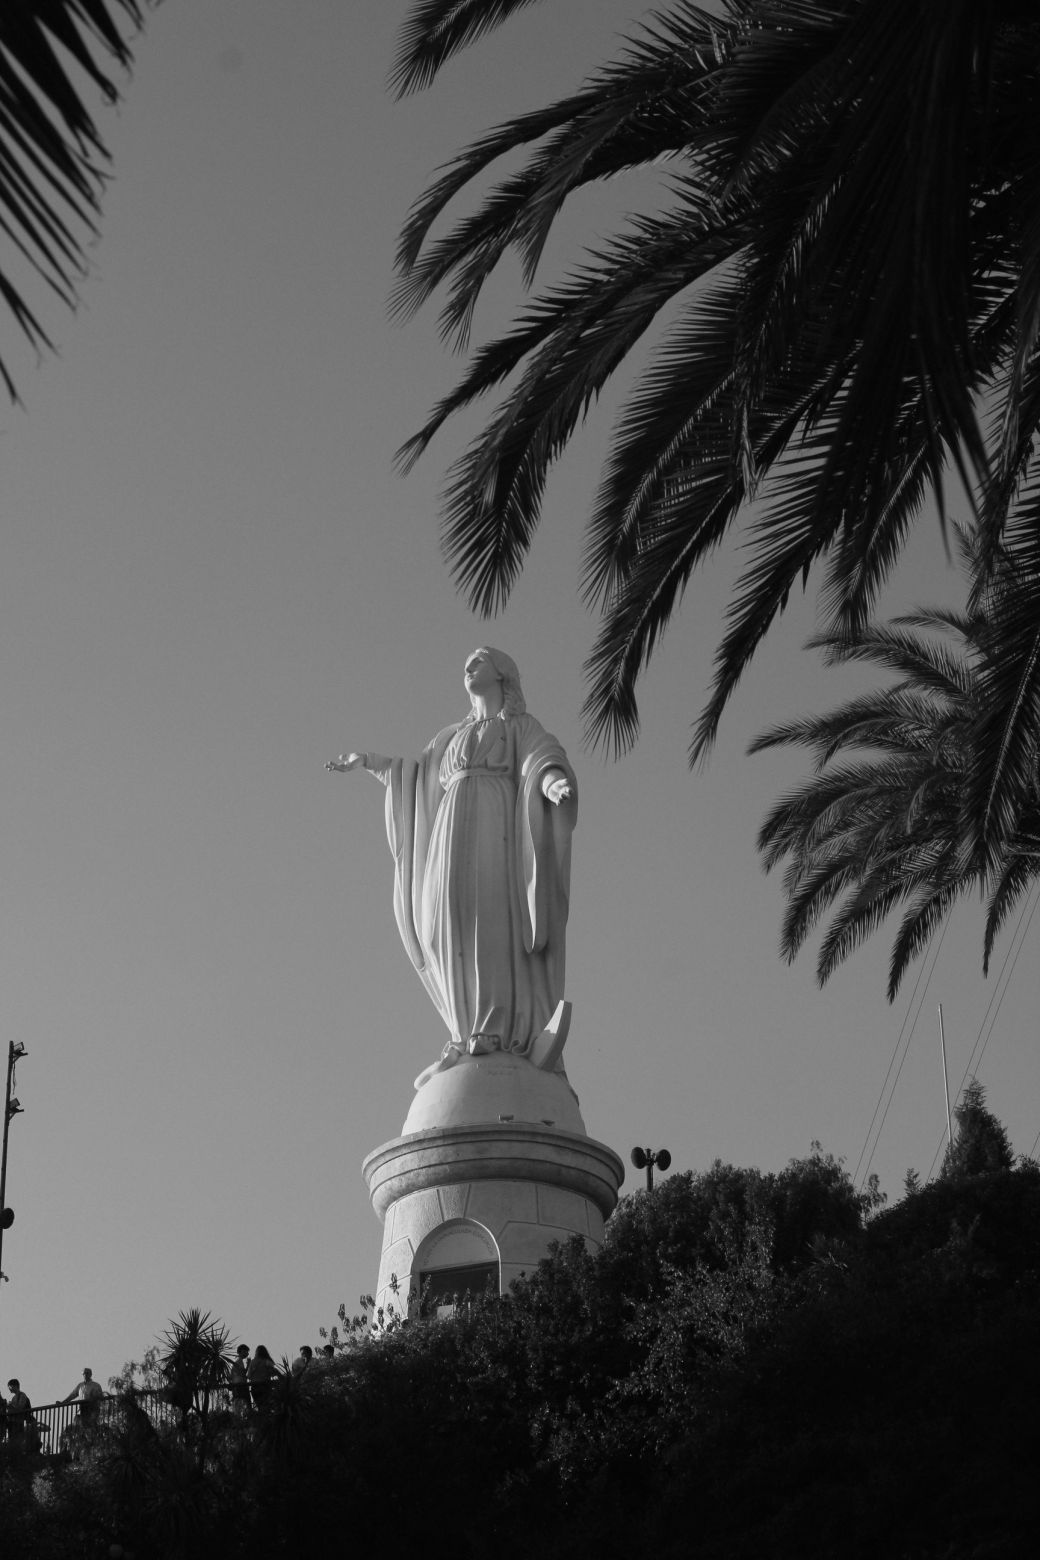 chile santiago san cristobal hill 5